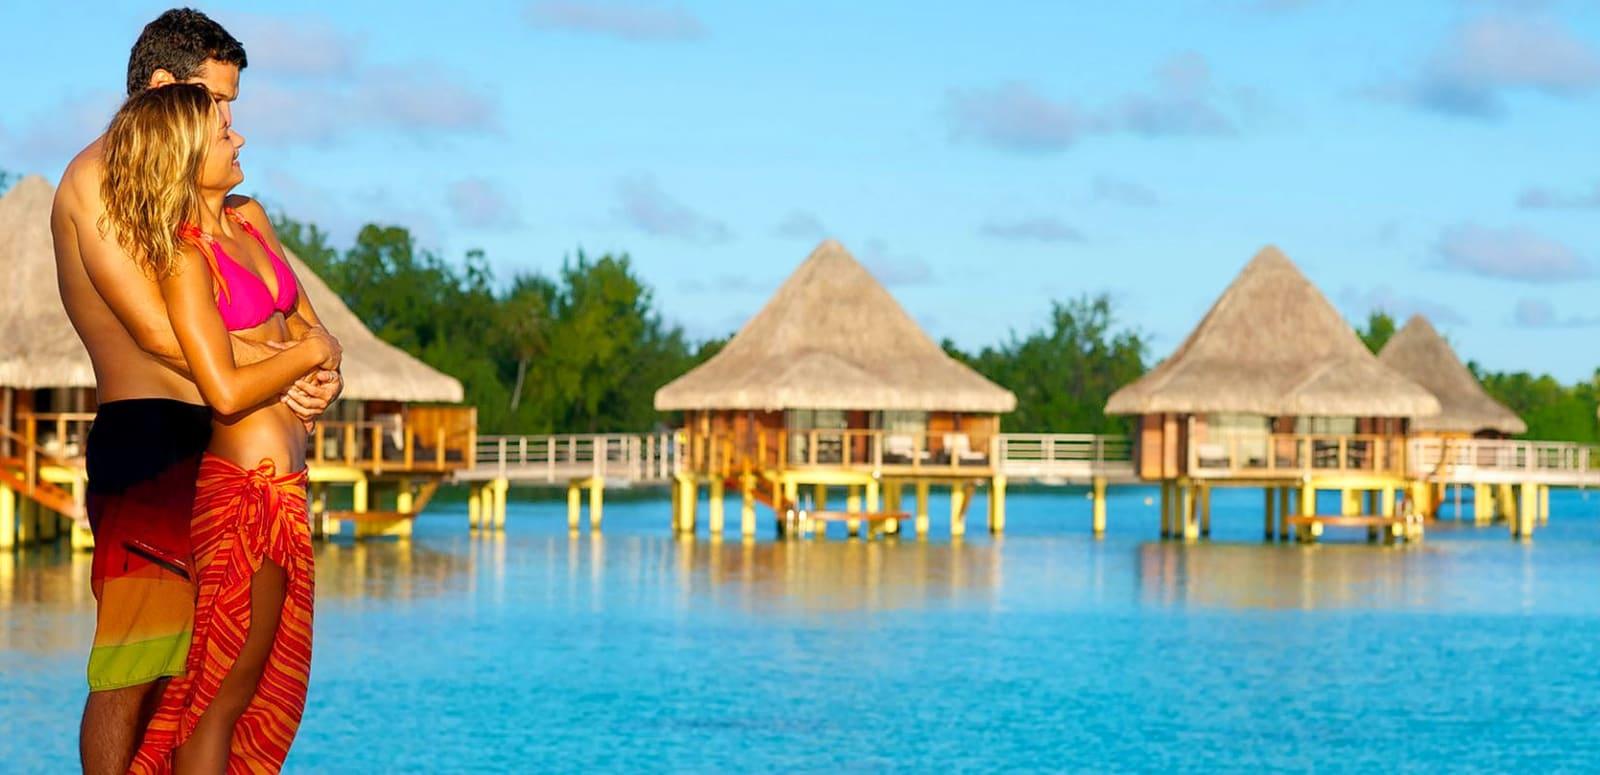 35 Private Pool Villas In Bali For Honeymoon 2019 Photos